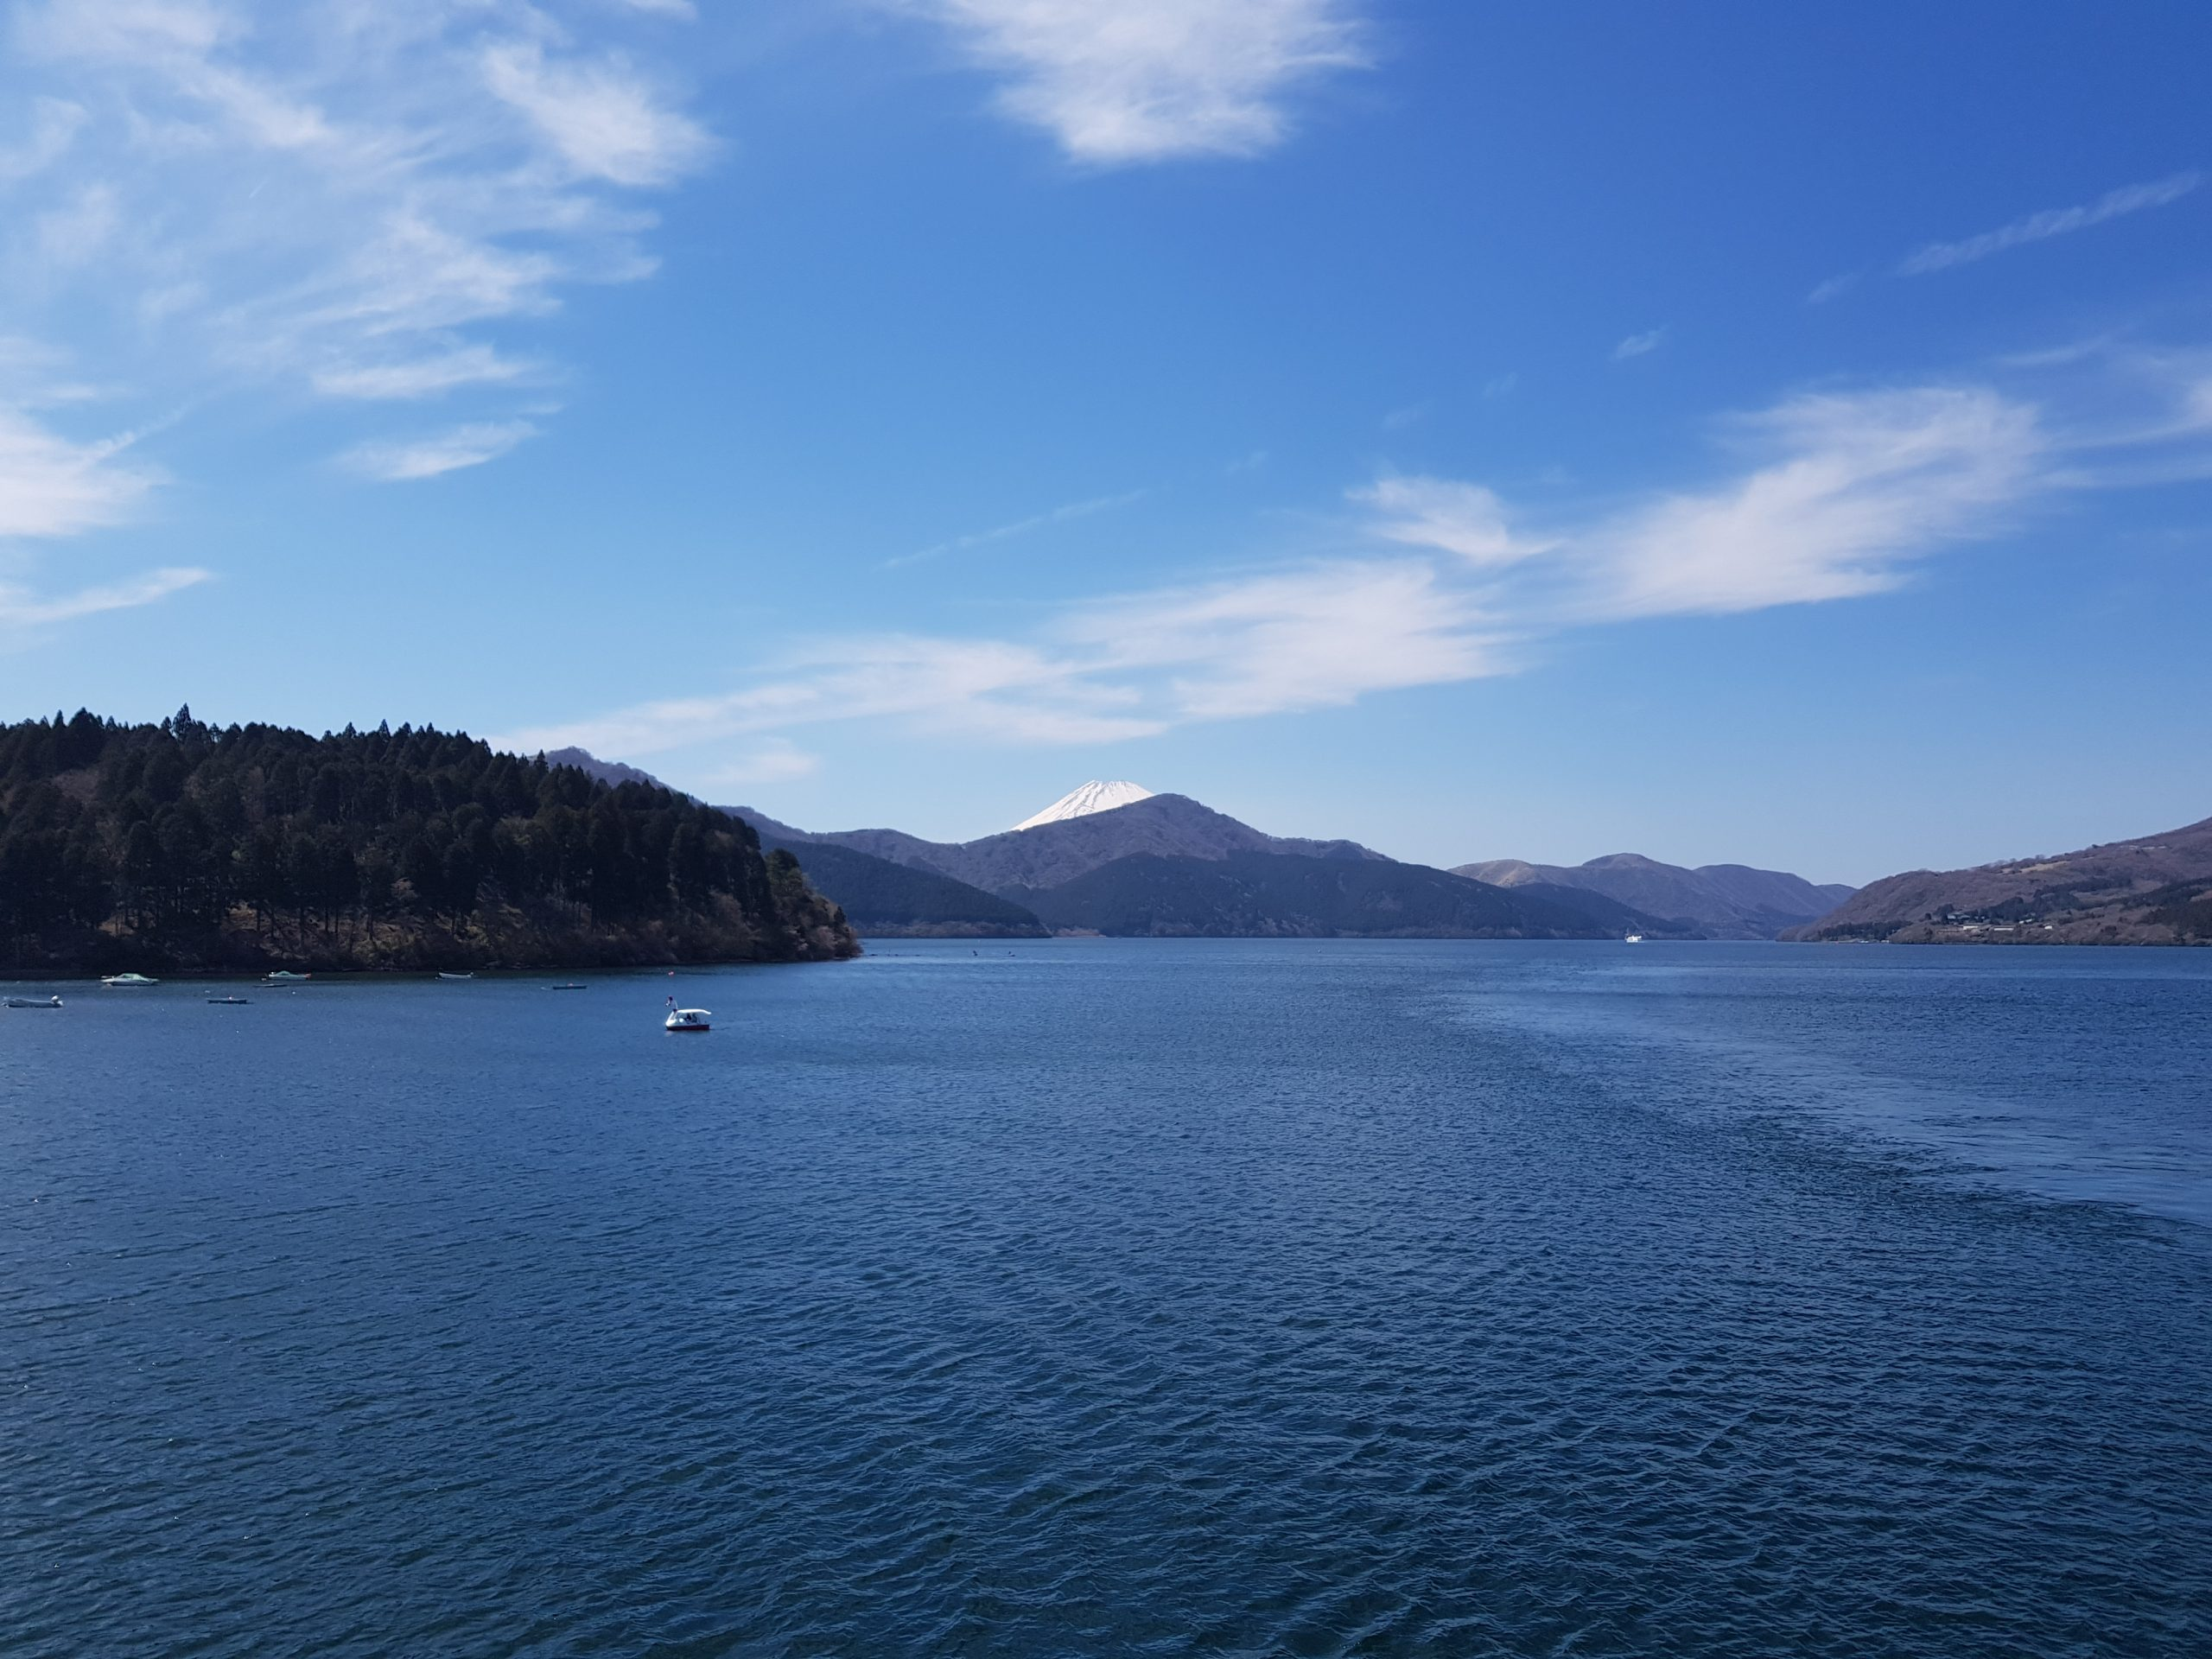 Ashi lake, Hakone